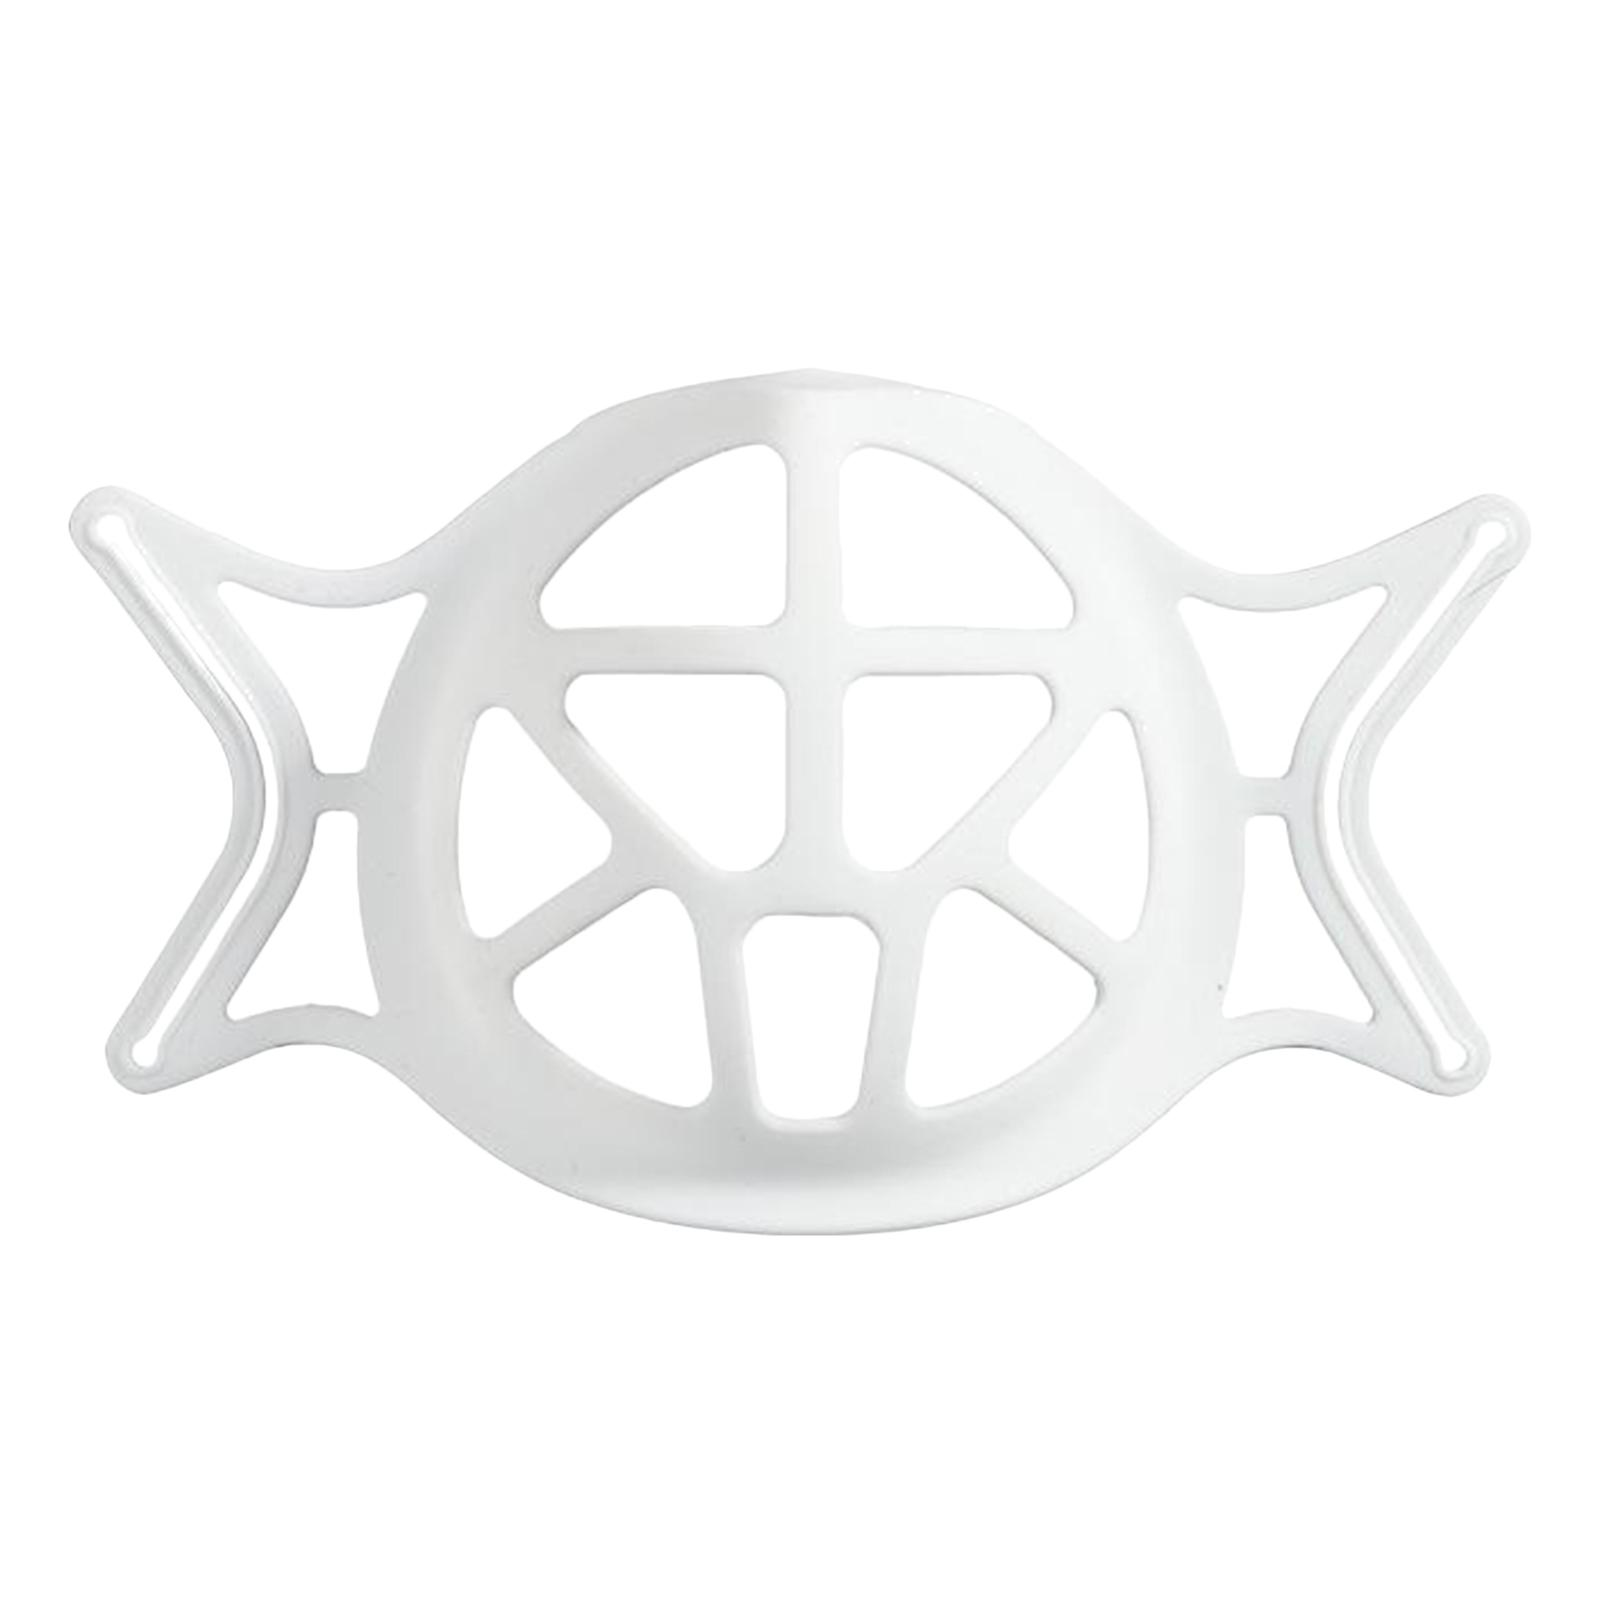 3D Face Mask Bracket Reusable Washable Support Frame Mouth Separate Rack